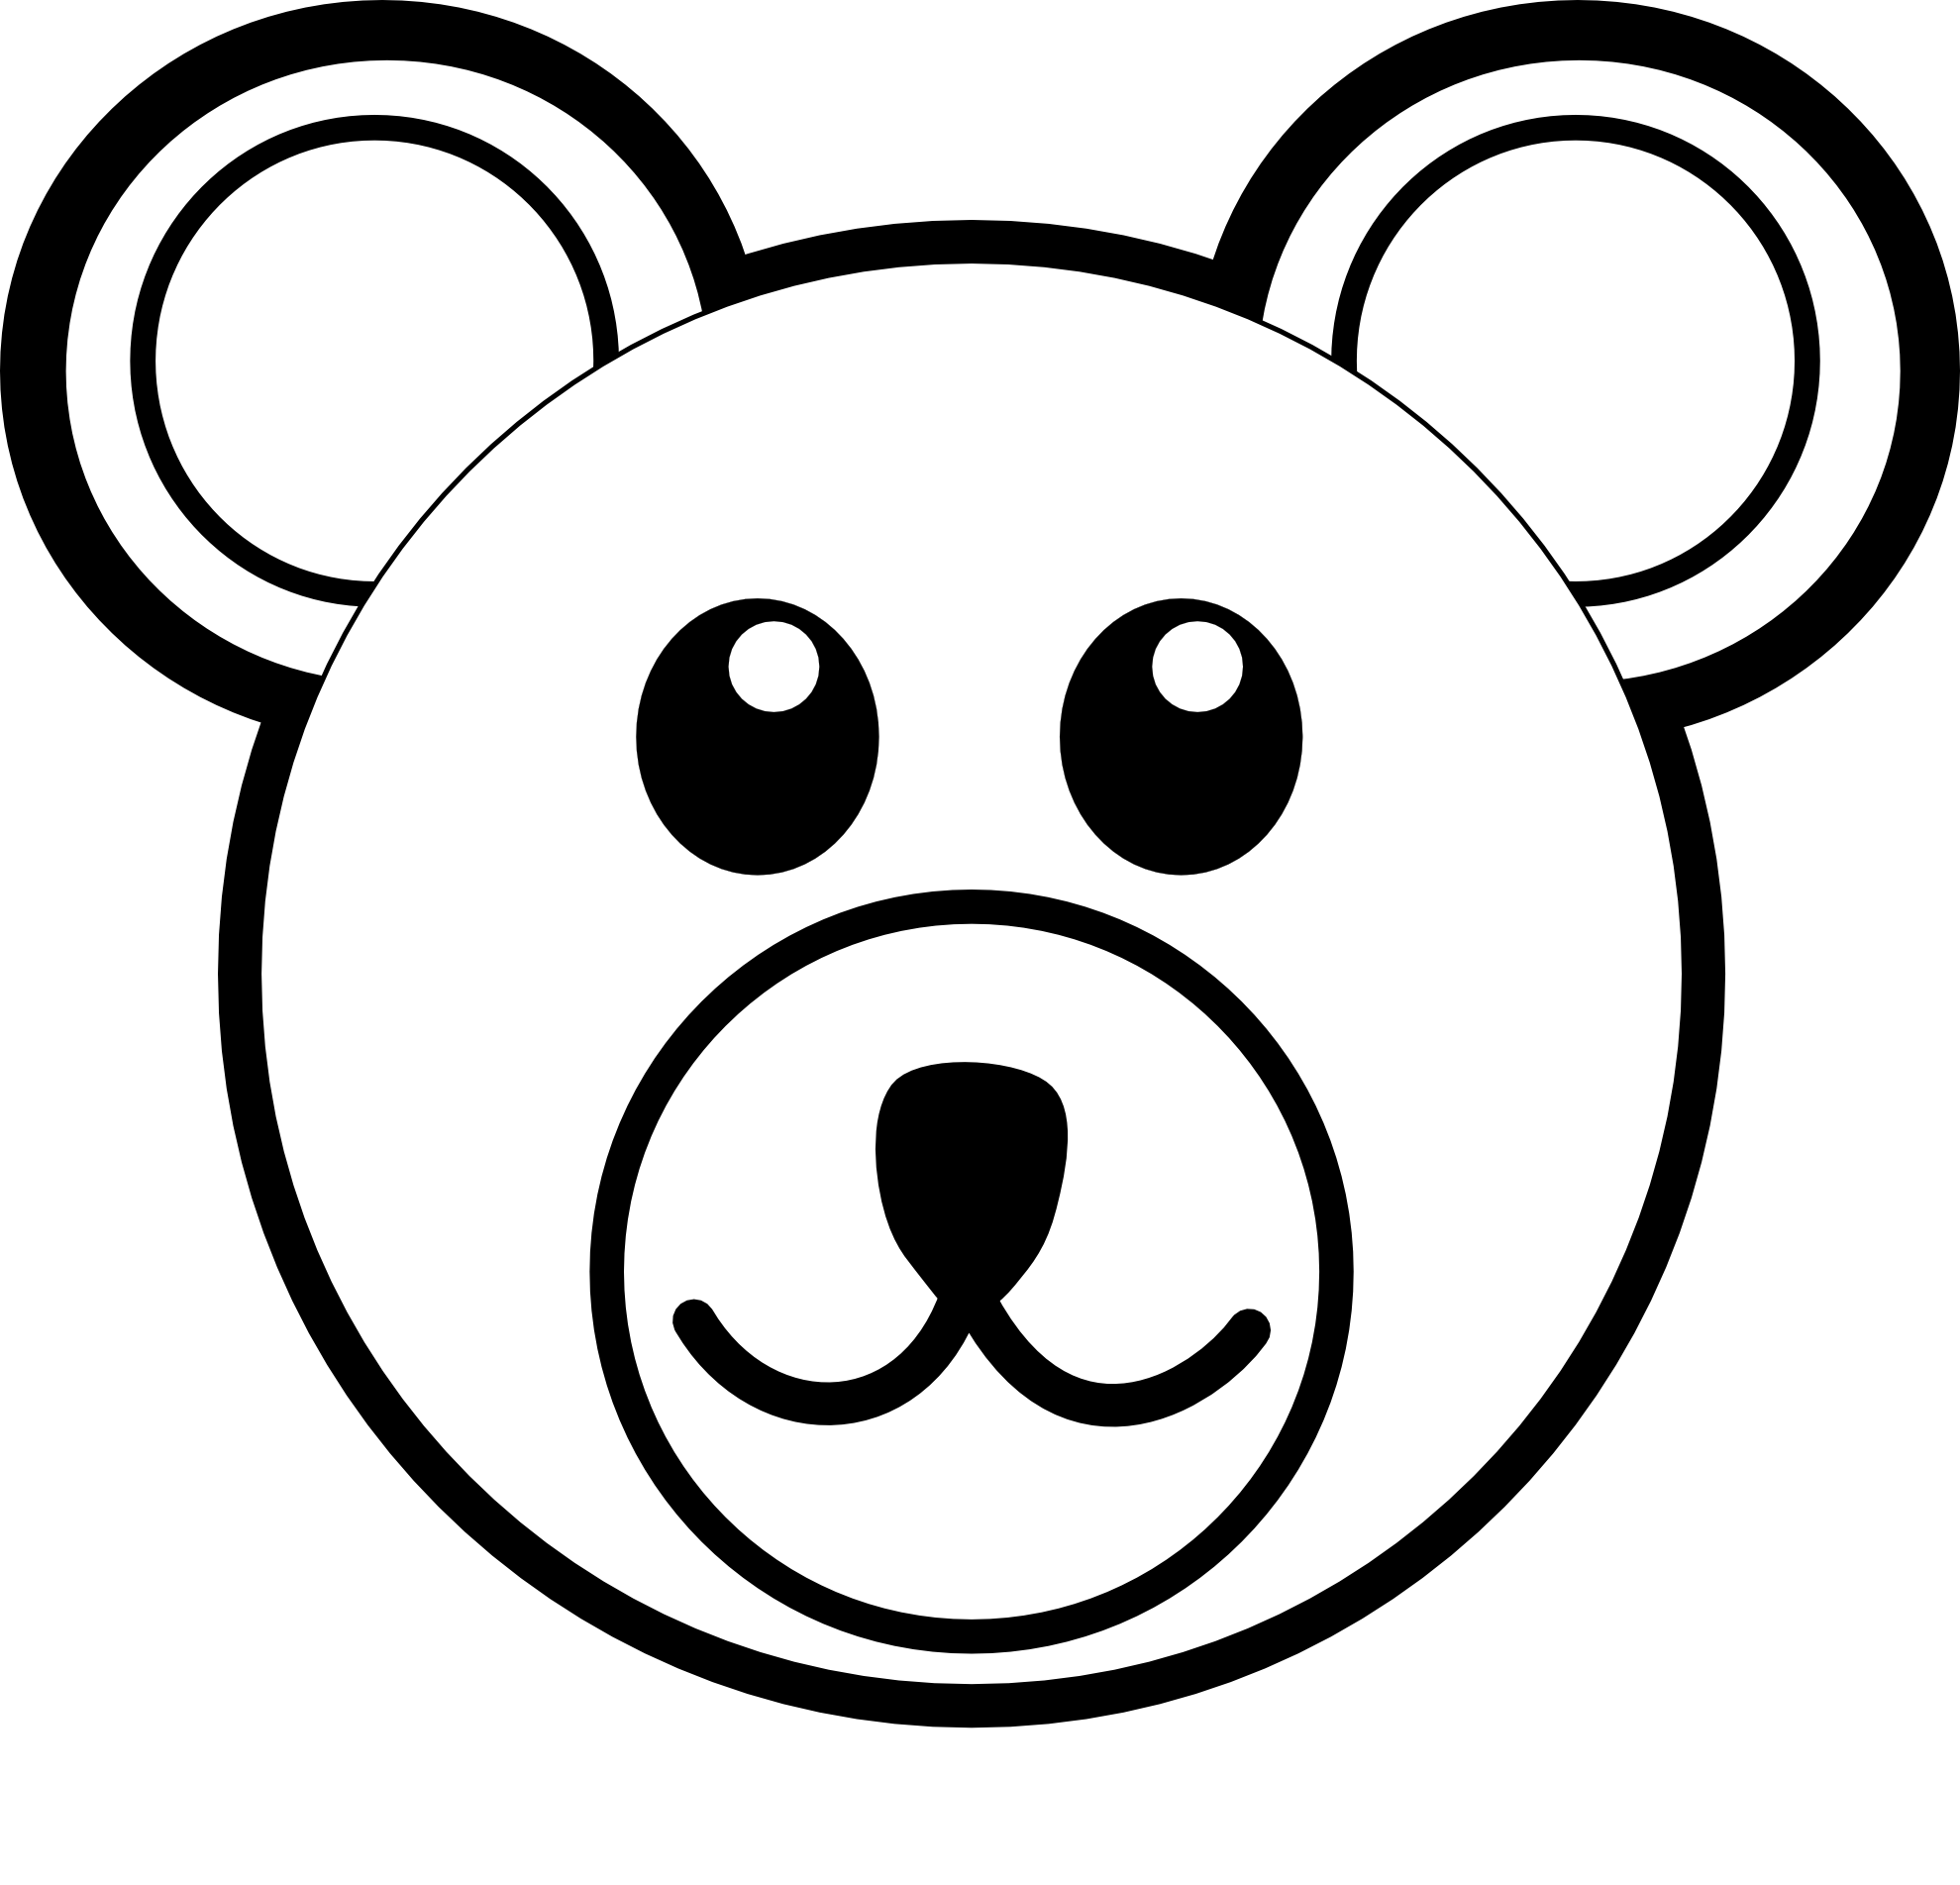 panda bear face coloring pages - photo#14